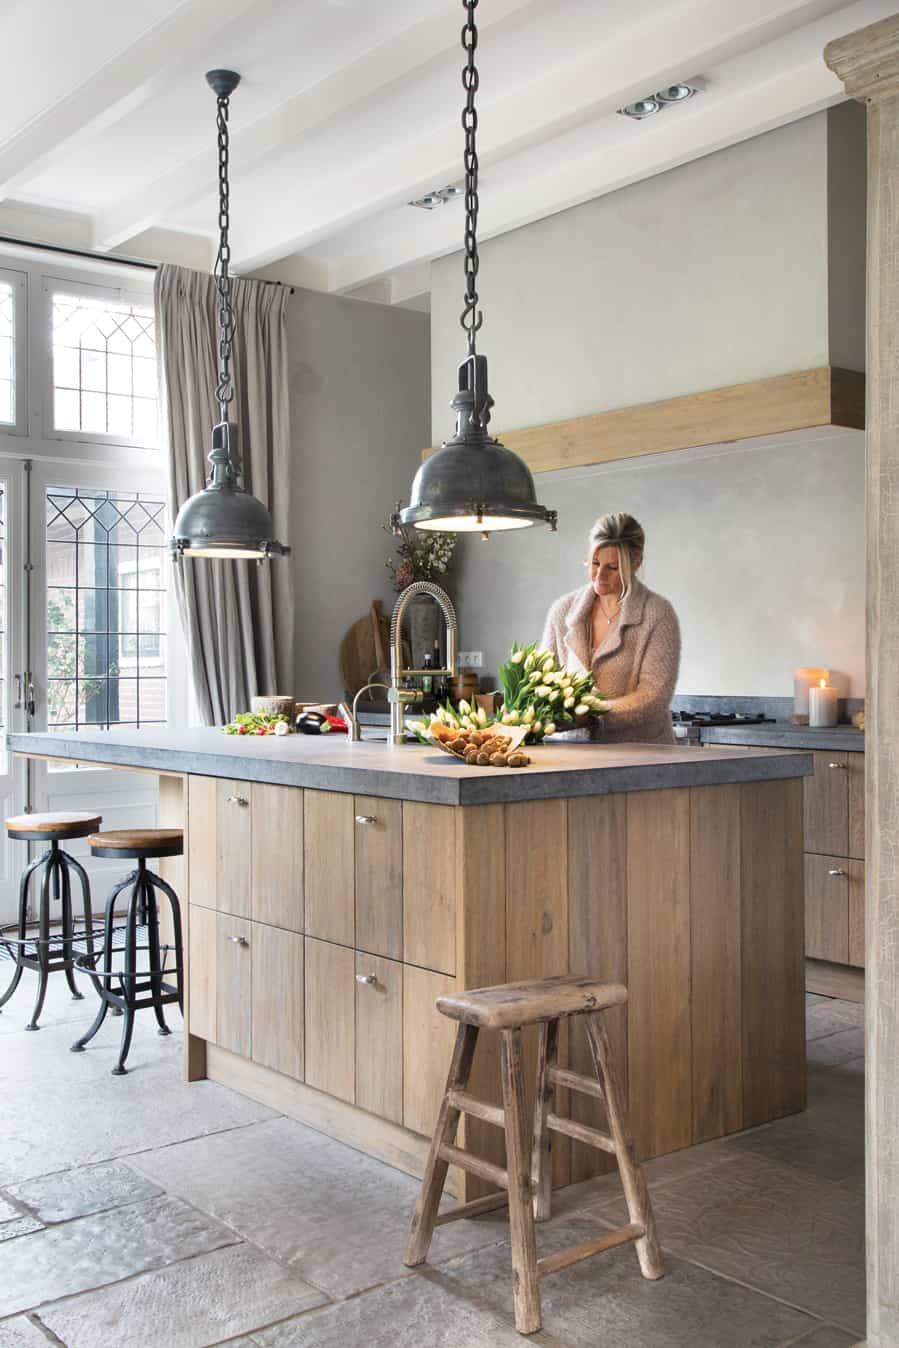 Gezellige houten keuken